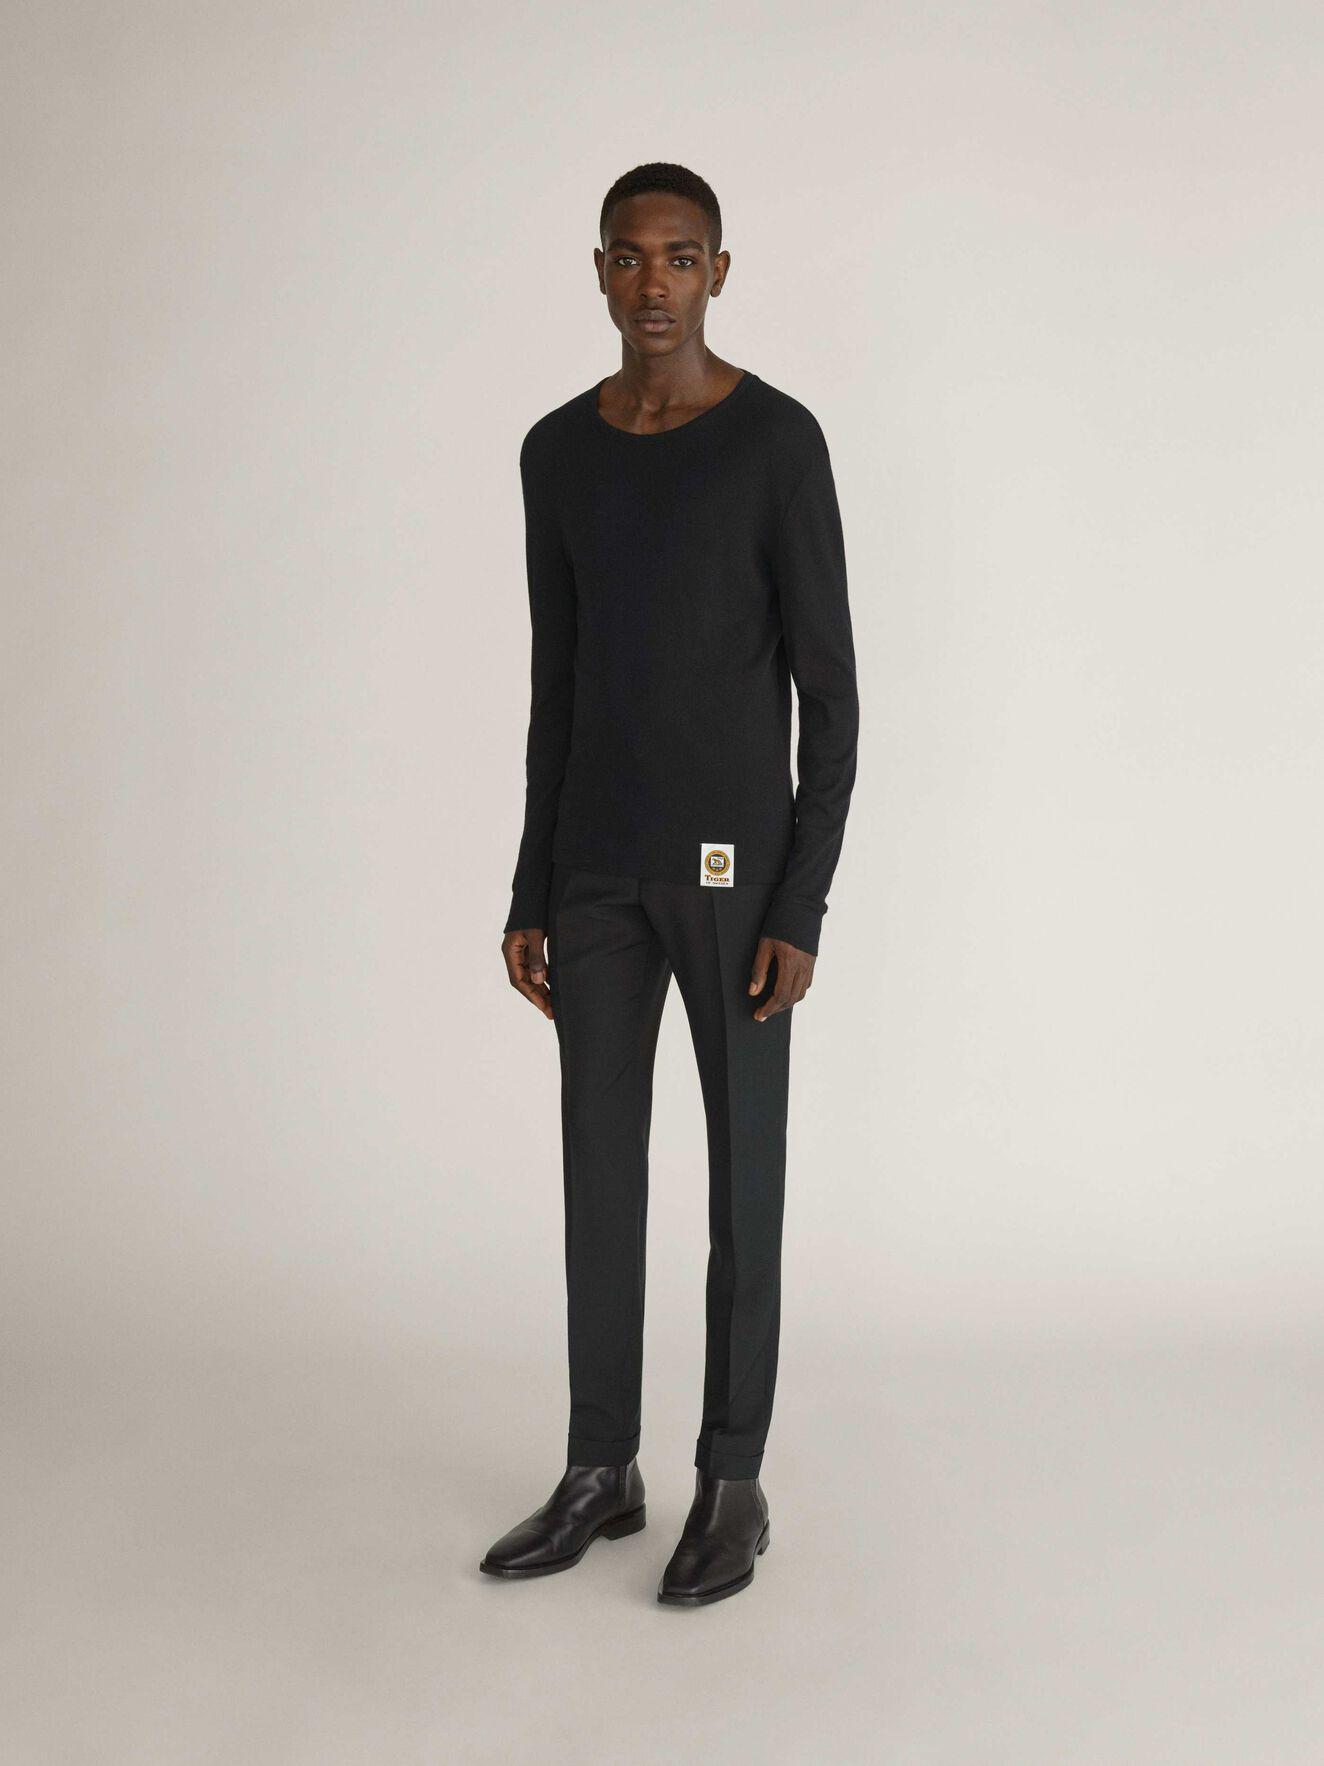 Davidson T-Shirt in Black from Tiger of Sweden